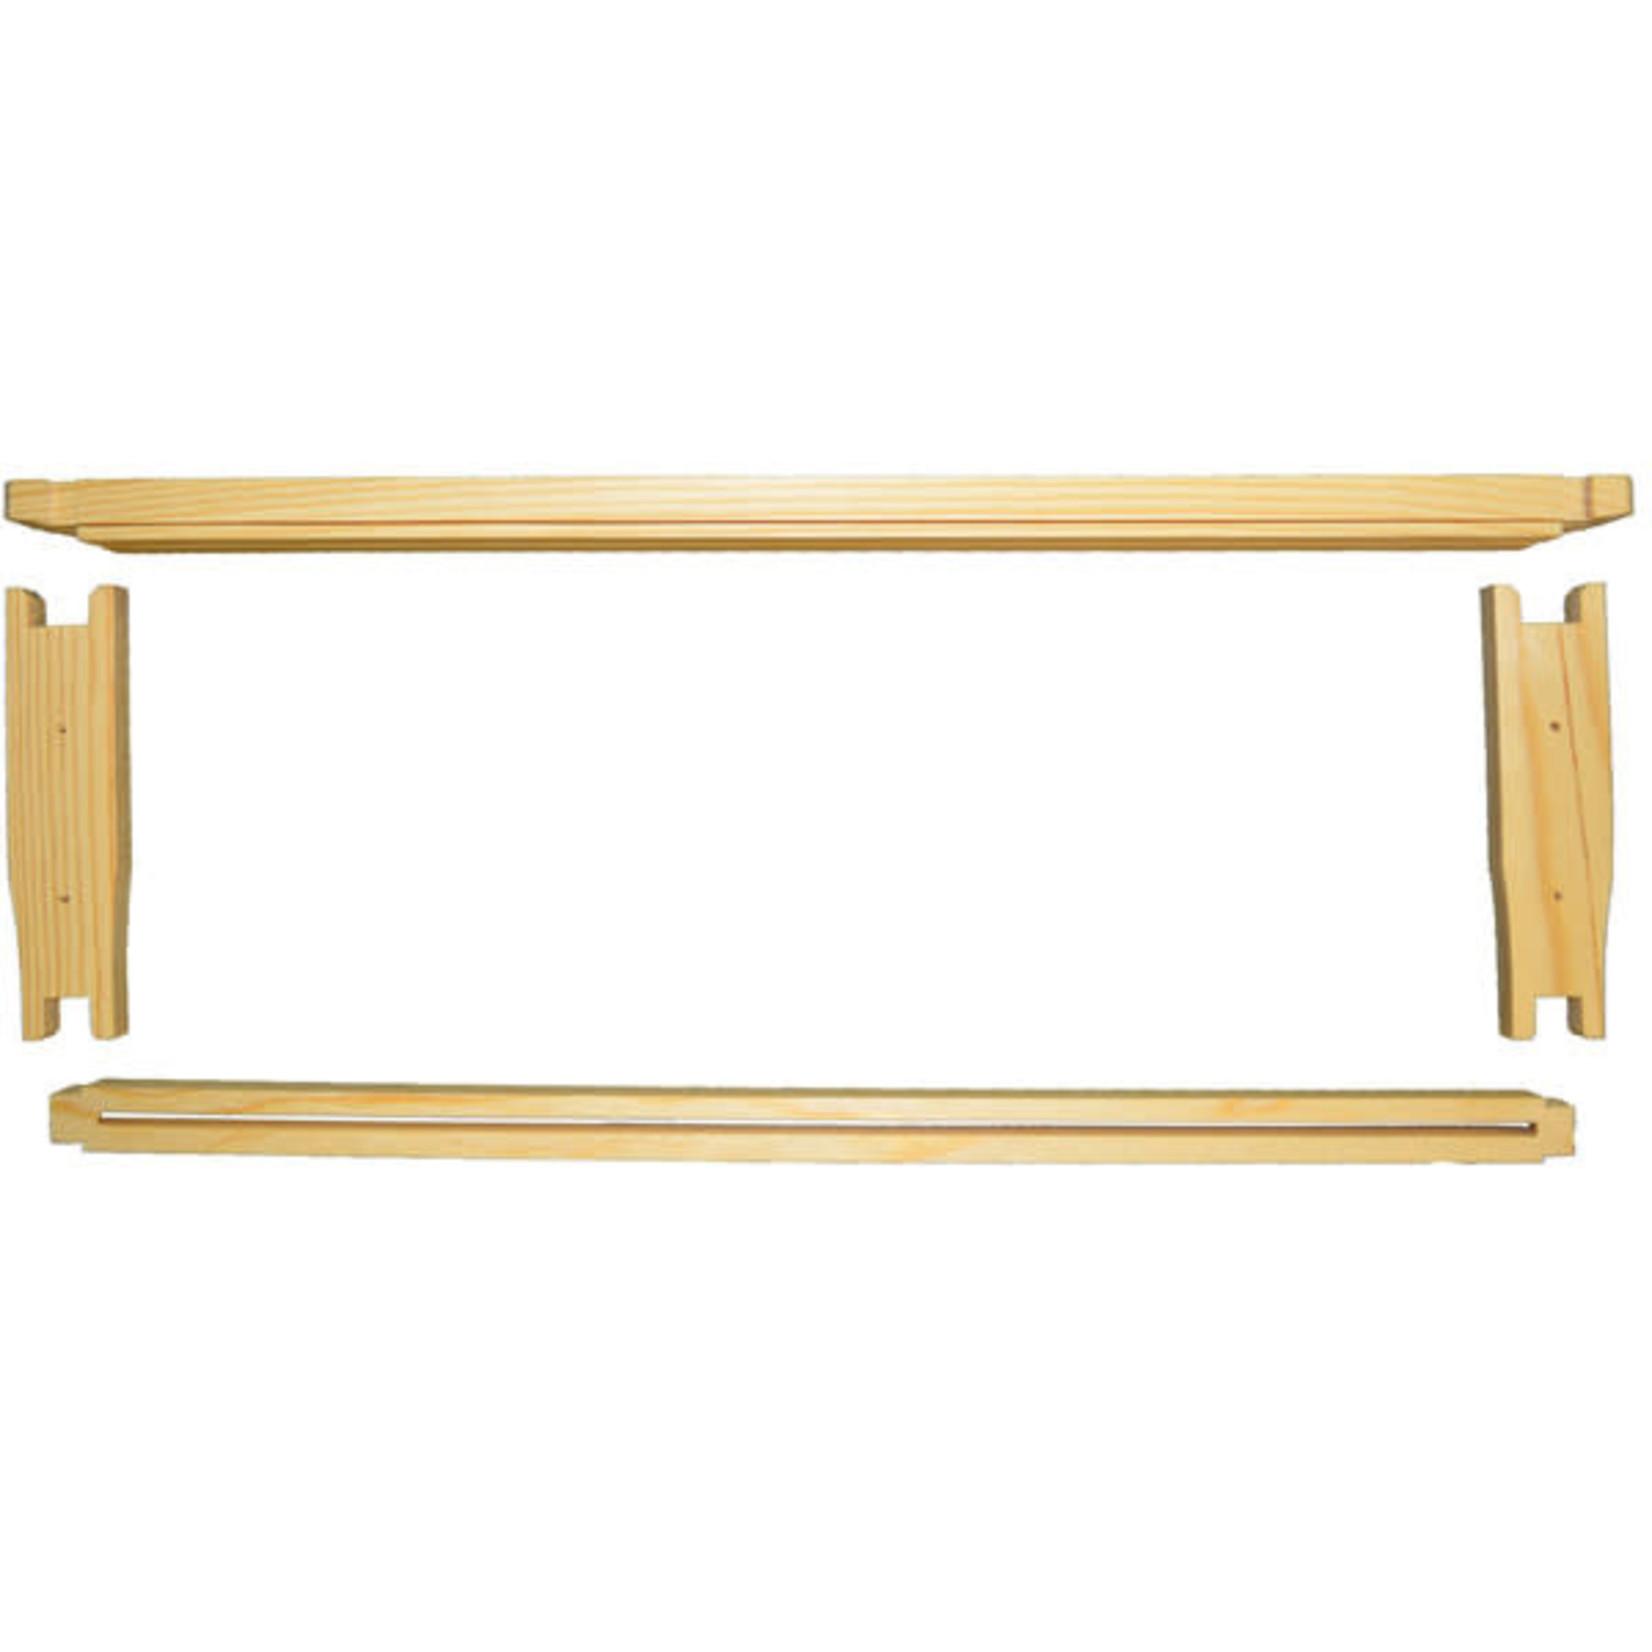 Bar Frames Shallow Self Space - (Bee Keeping Equipment)